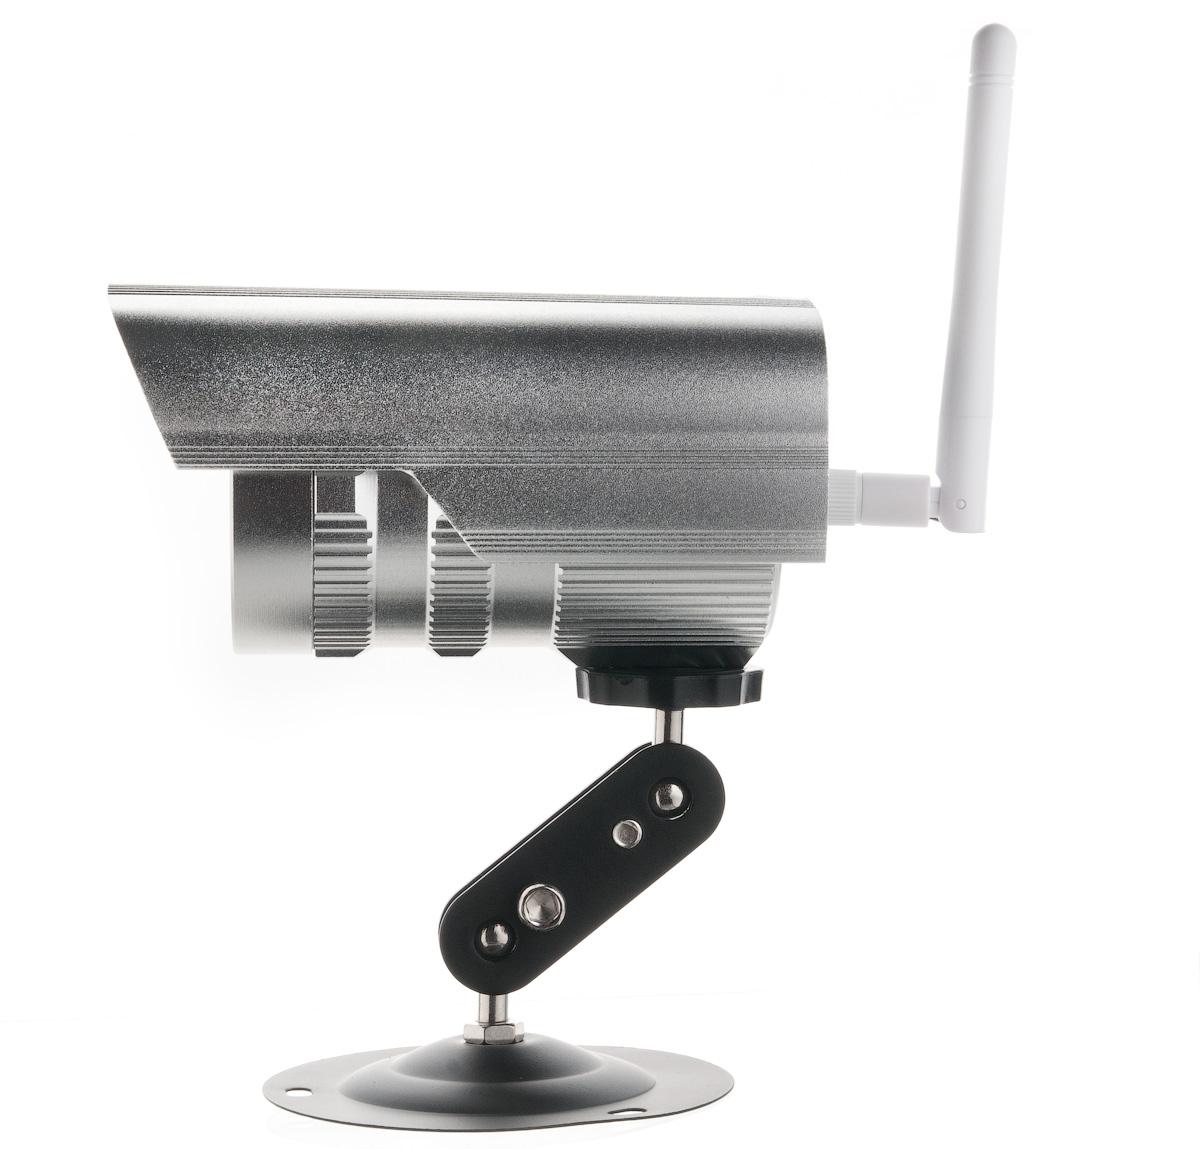 LC-359 IP - Kamery zintegrowane IP